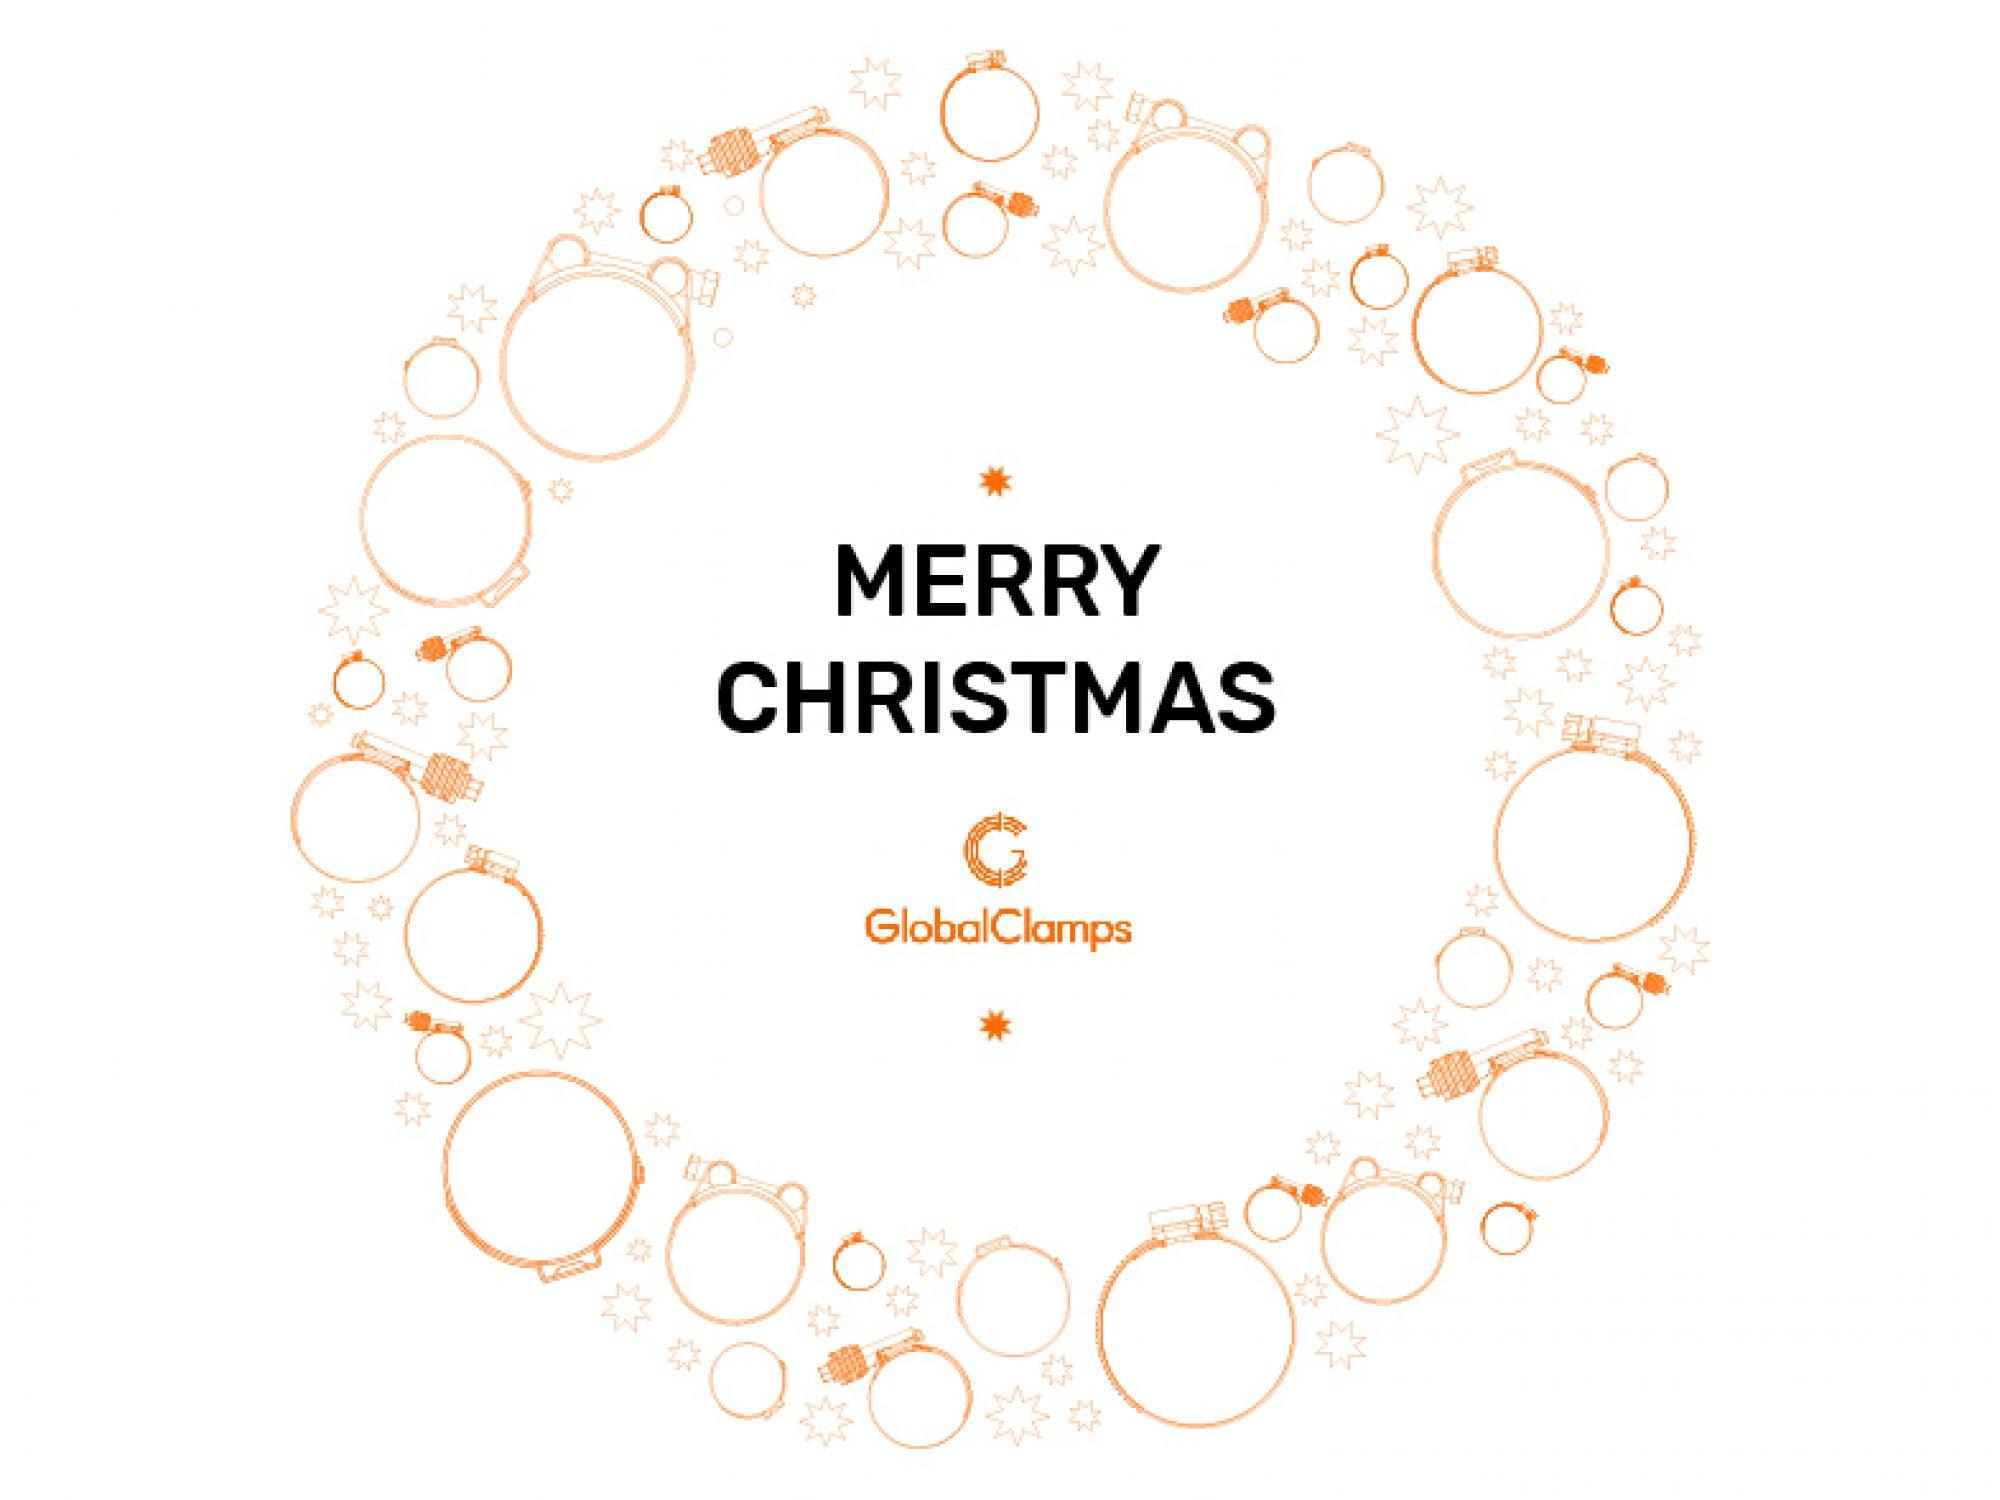 Merry Christmas New Image